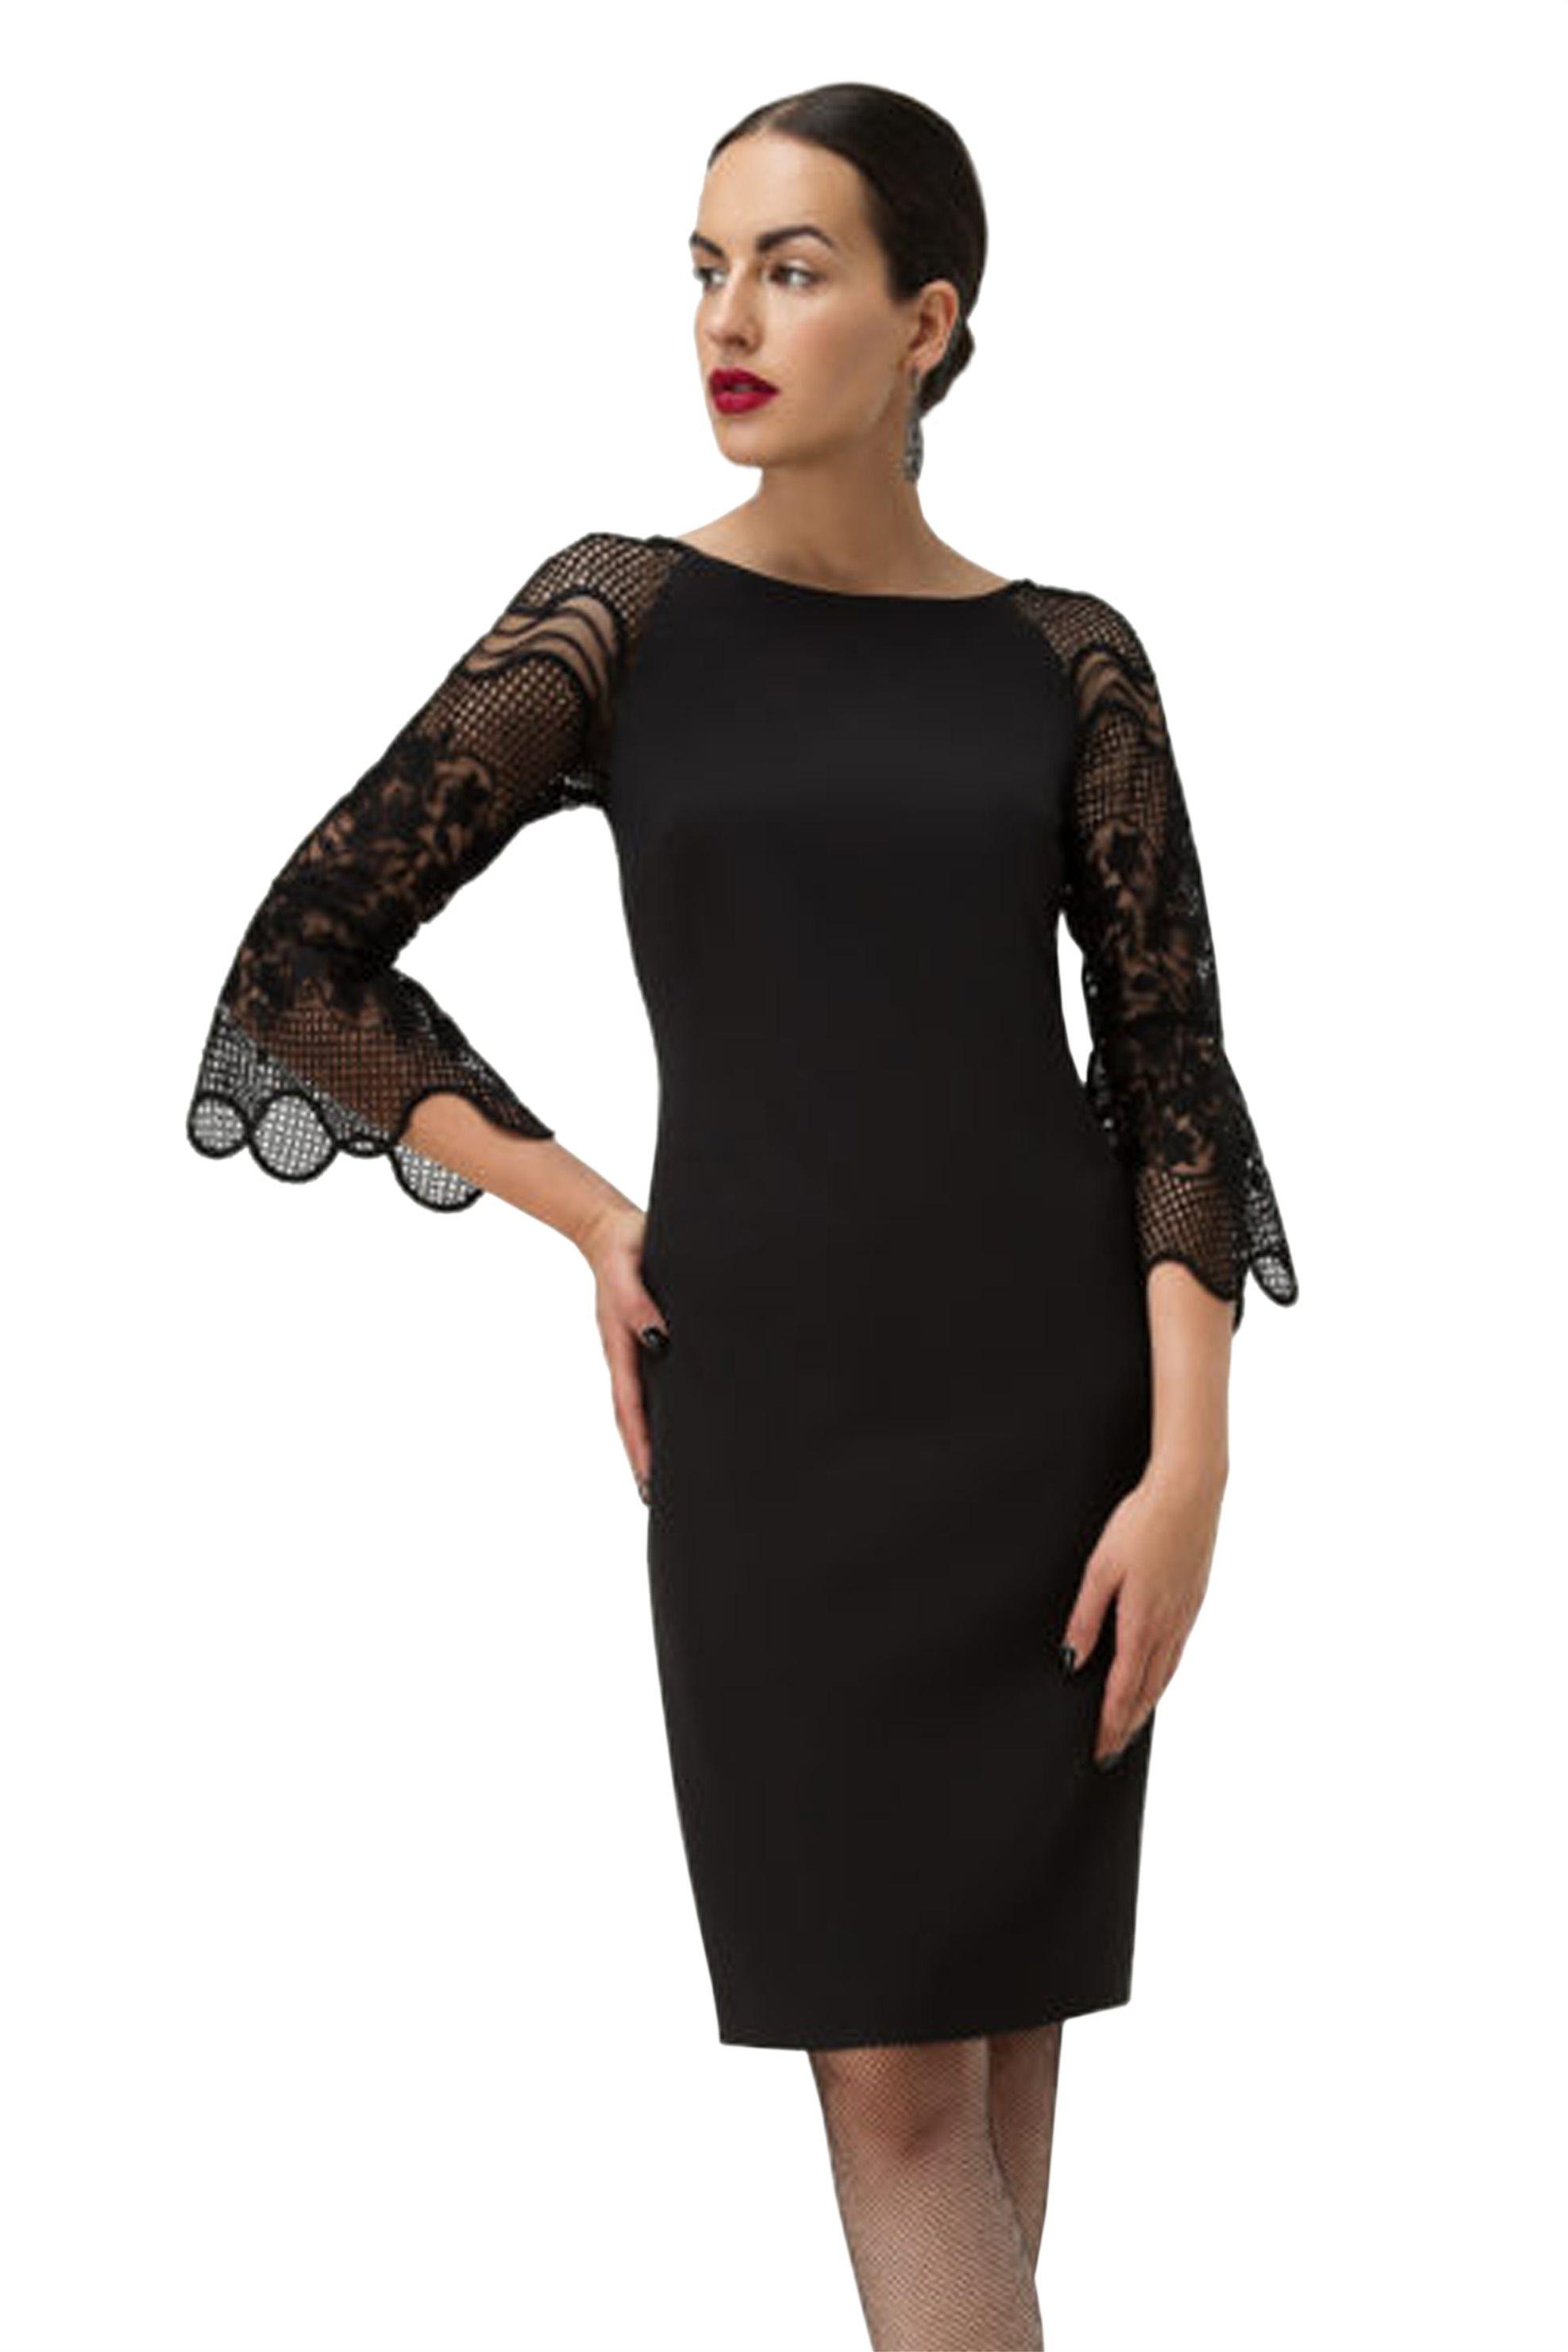 Billy Sabbado γυναικείο φόρεμα με μανίκια 3/4 από δαντέλα - 0110965511 - Μαύρο γυναικα   ρουχα   φορέματα   mini φορέματα